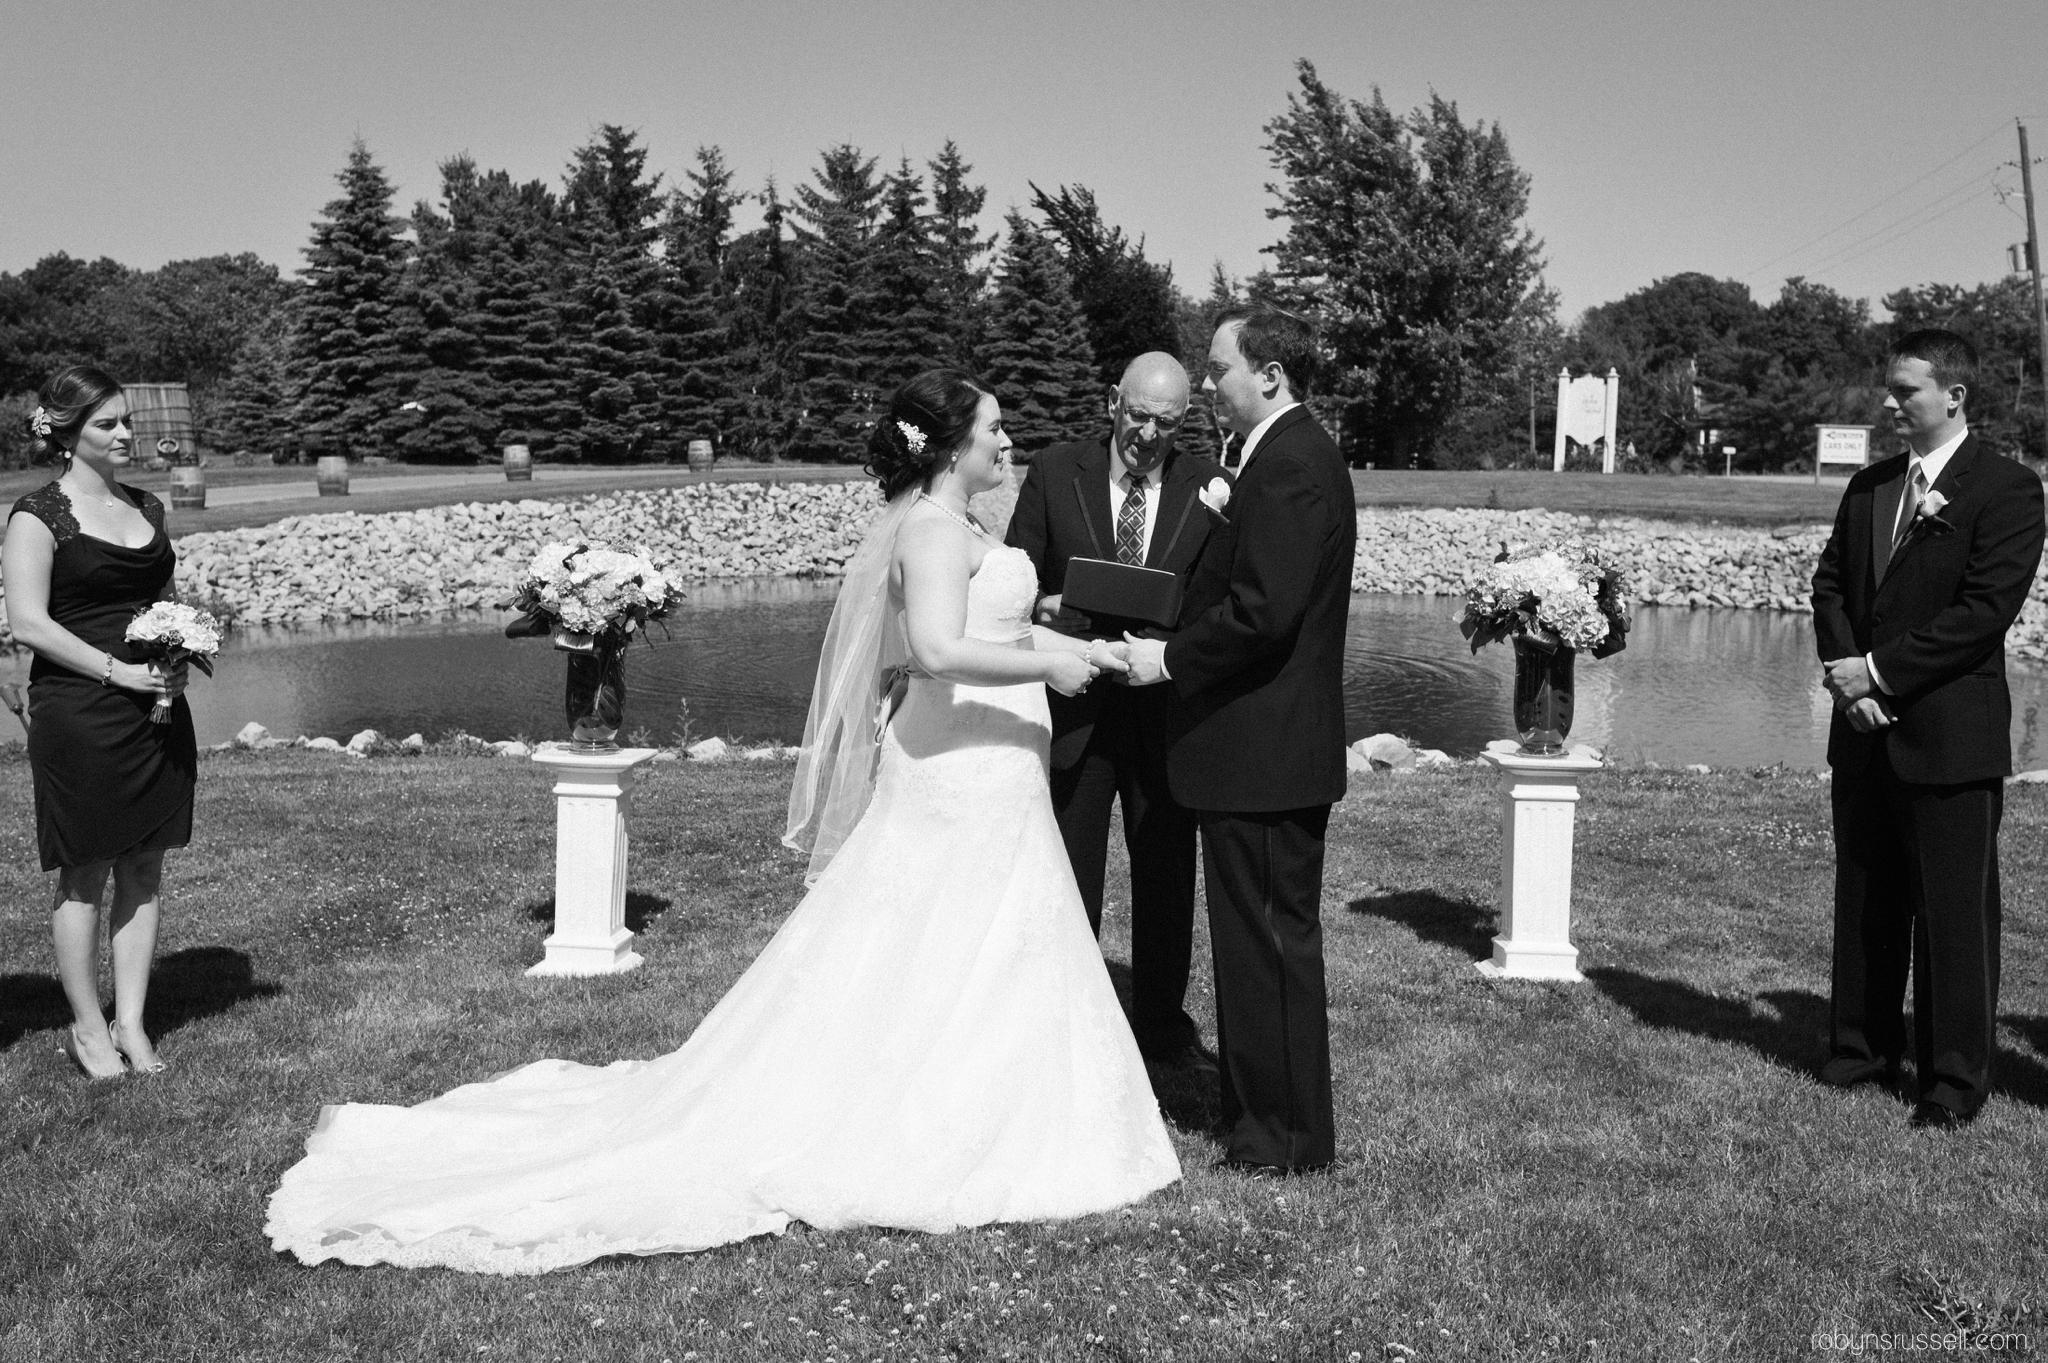 21-black-and-white-wedding-ceremony-hernder-winery.jpg